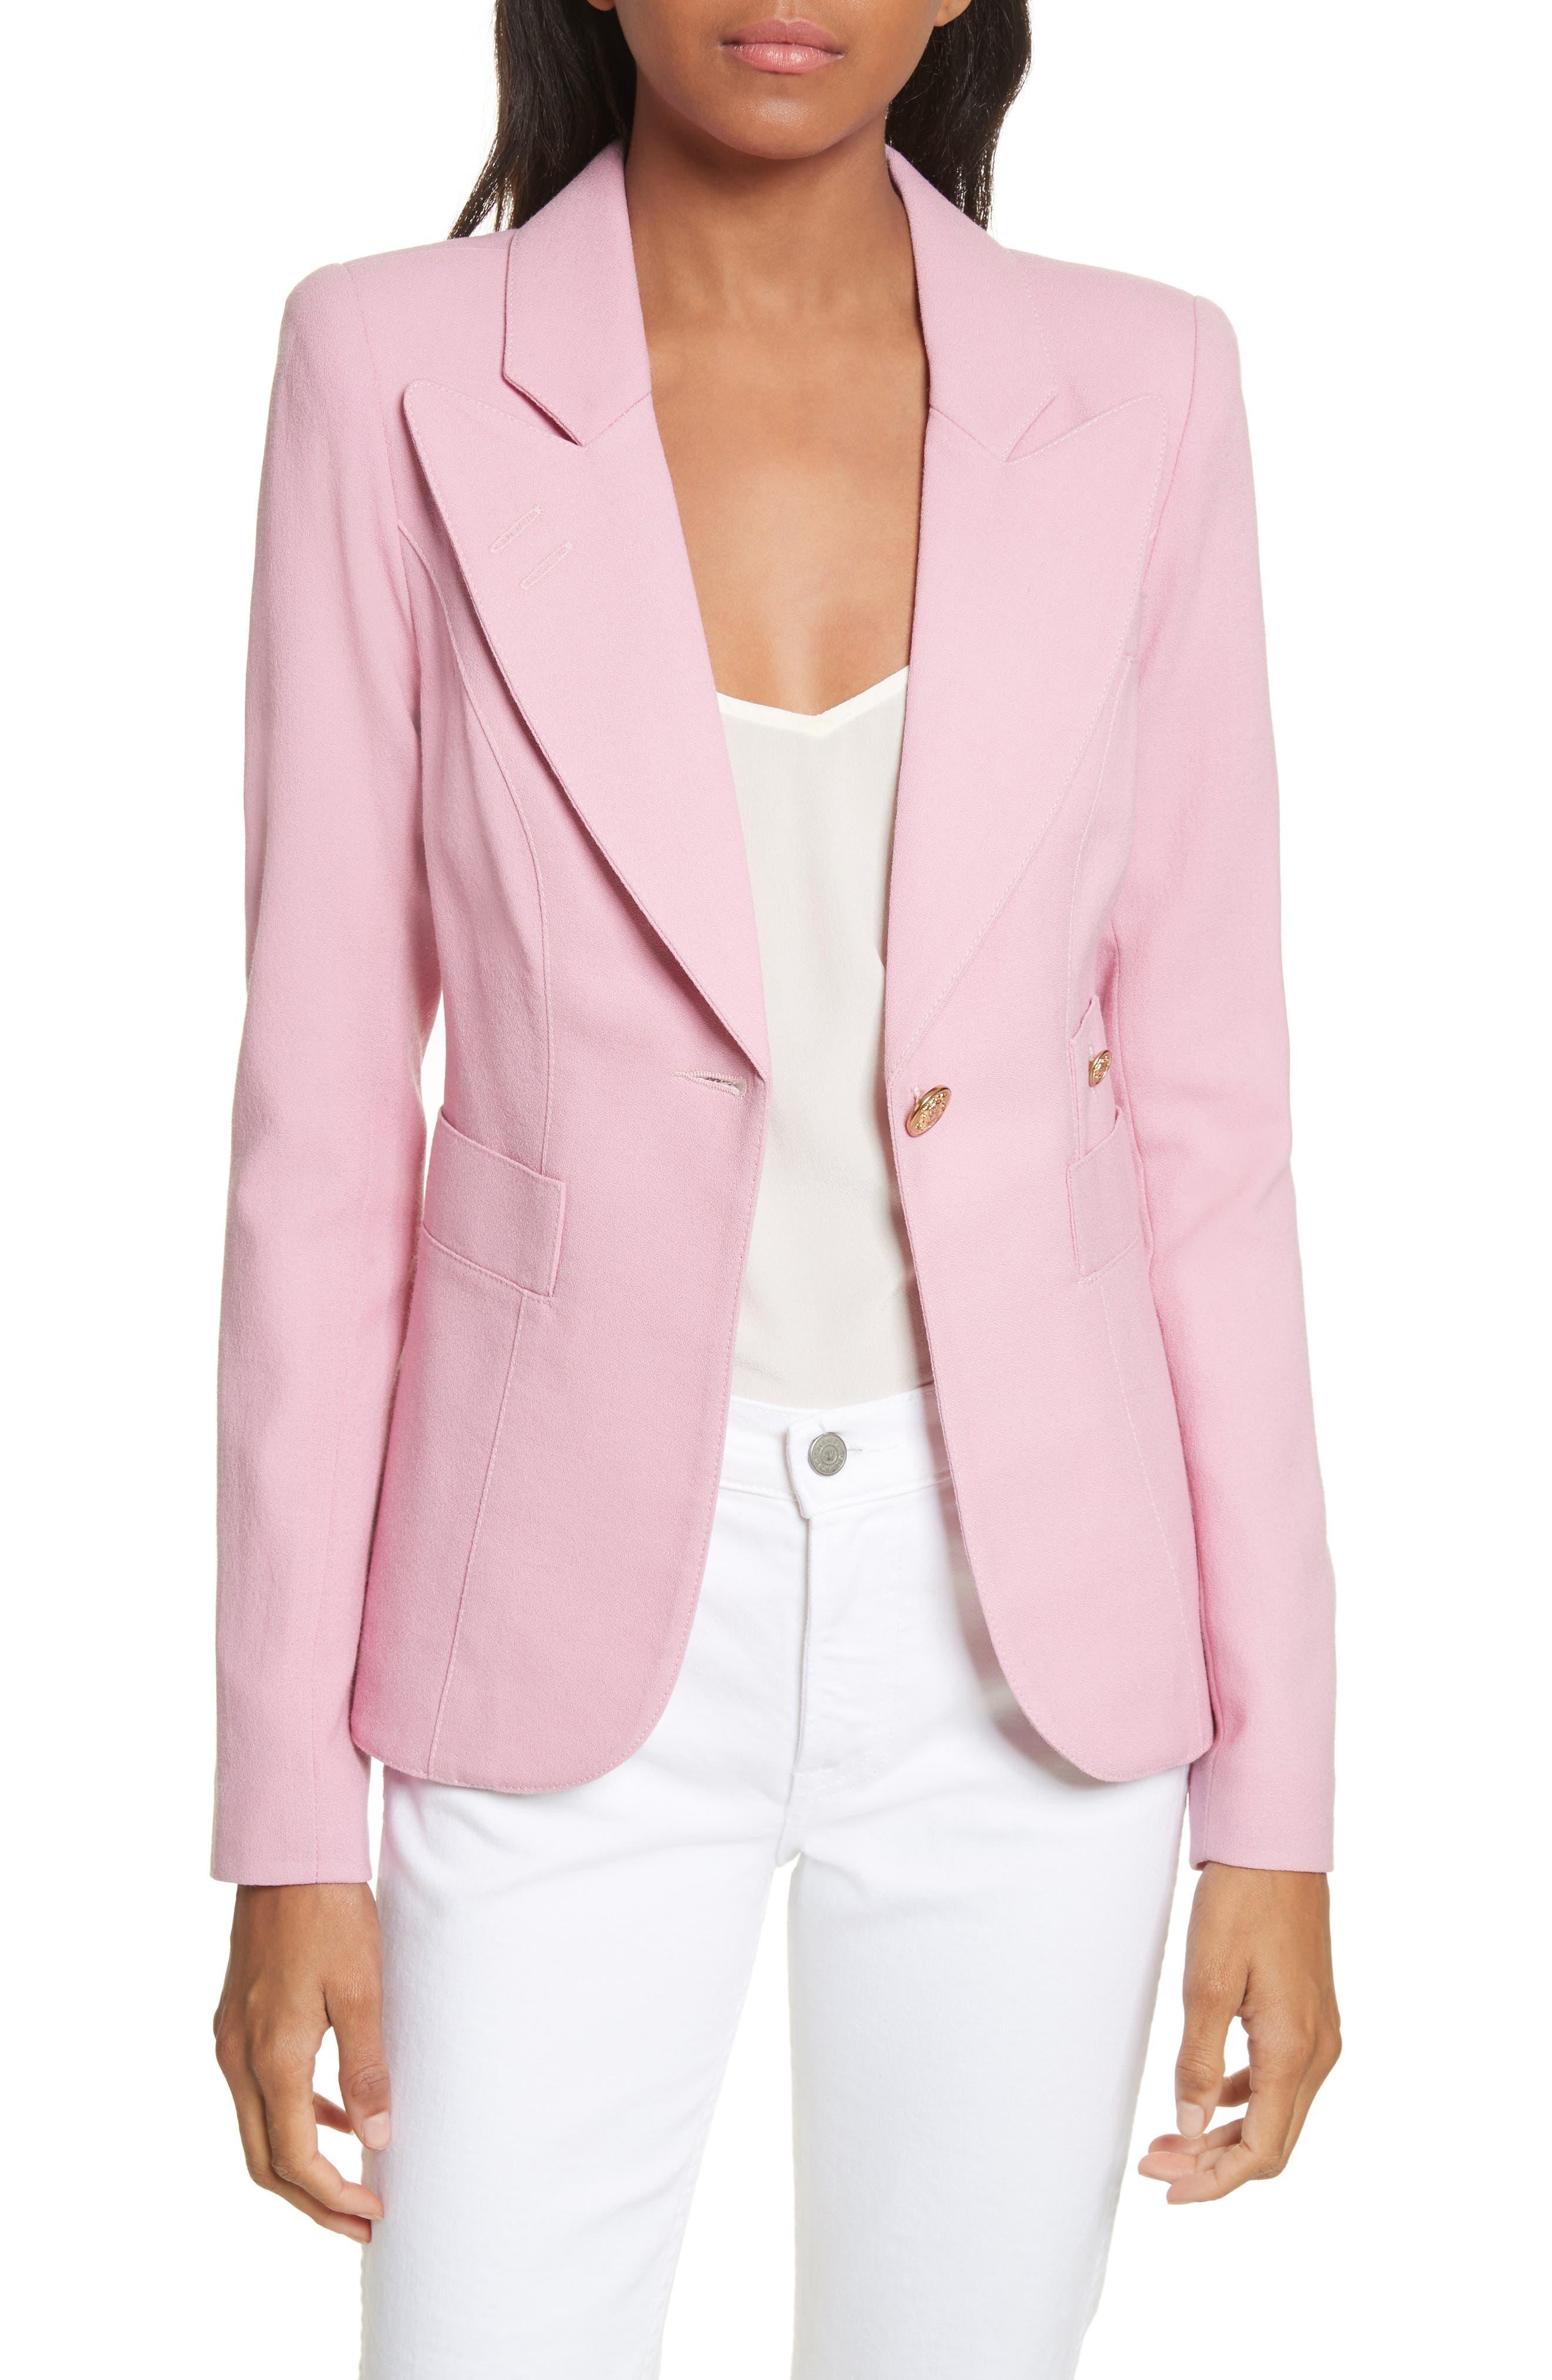 Main Image - Smythe 'Duchess' Single Button Blazer